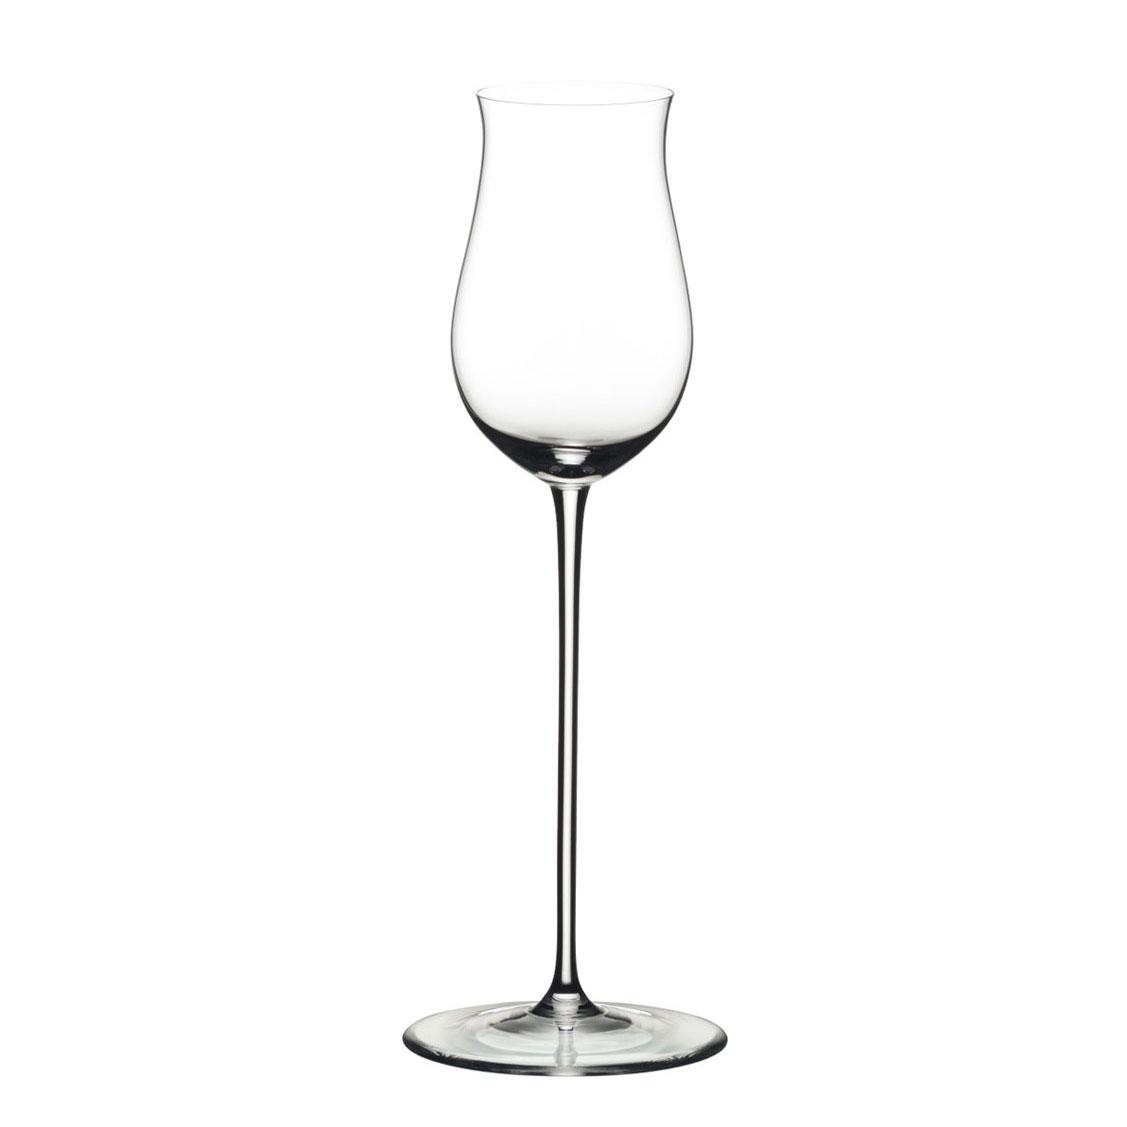 Riedel Veritas, Spirits Crystal Wine Glass, Single